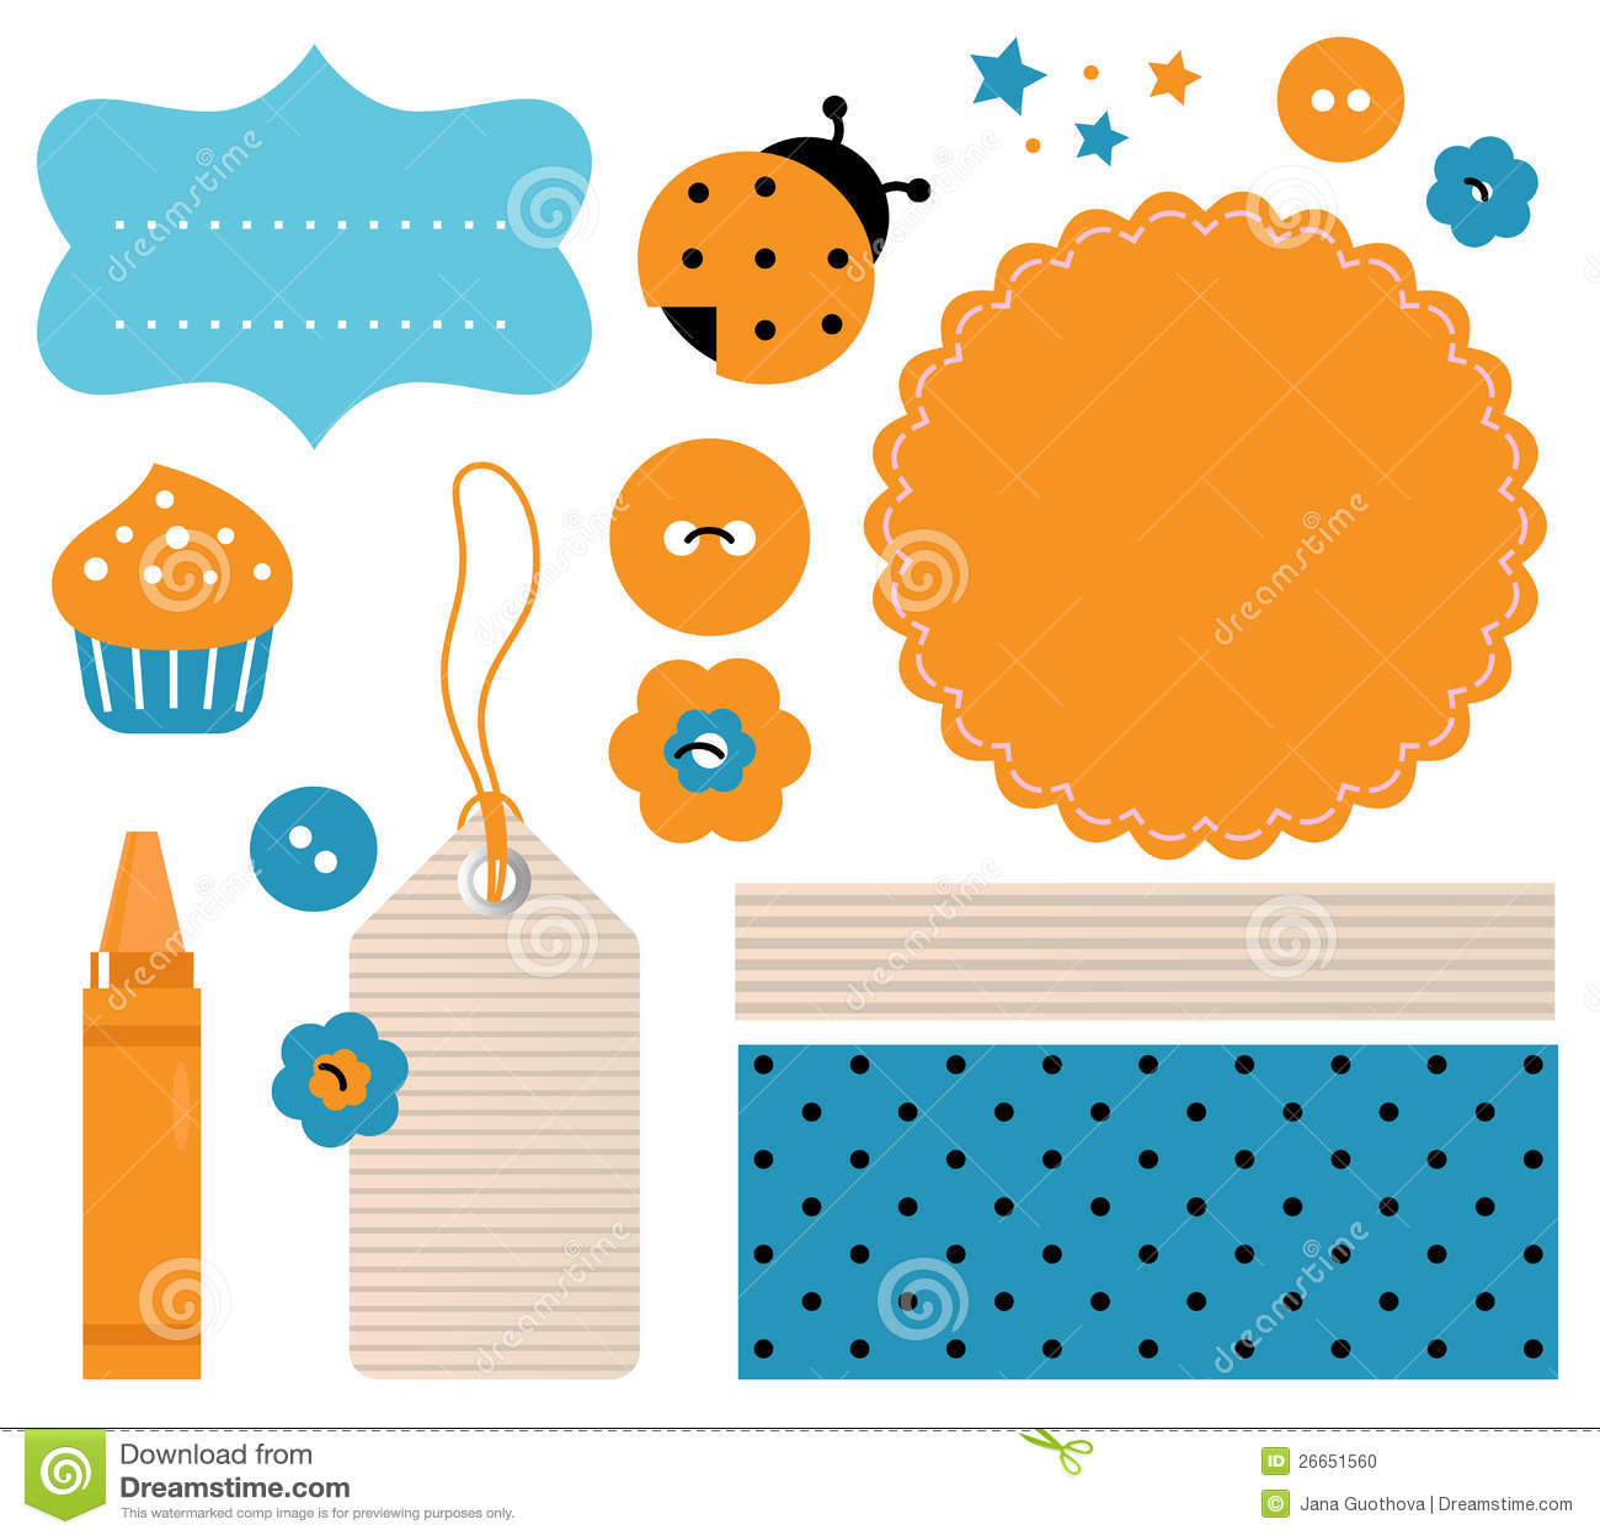 Scrapbook Design Elements Stock Photo - Image: 26651560